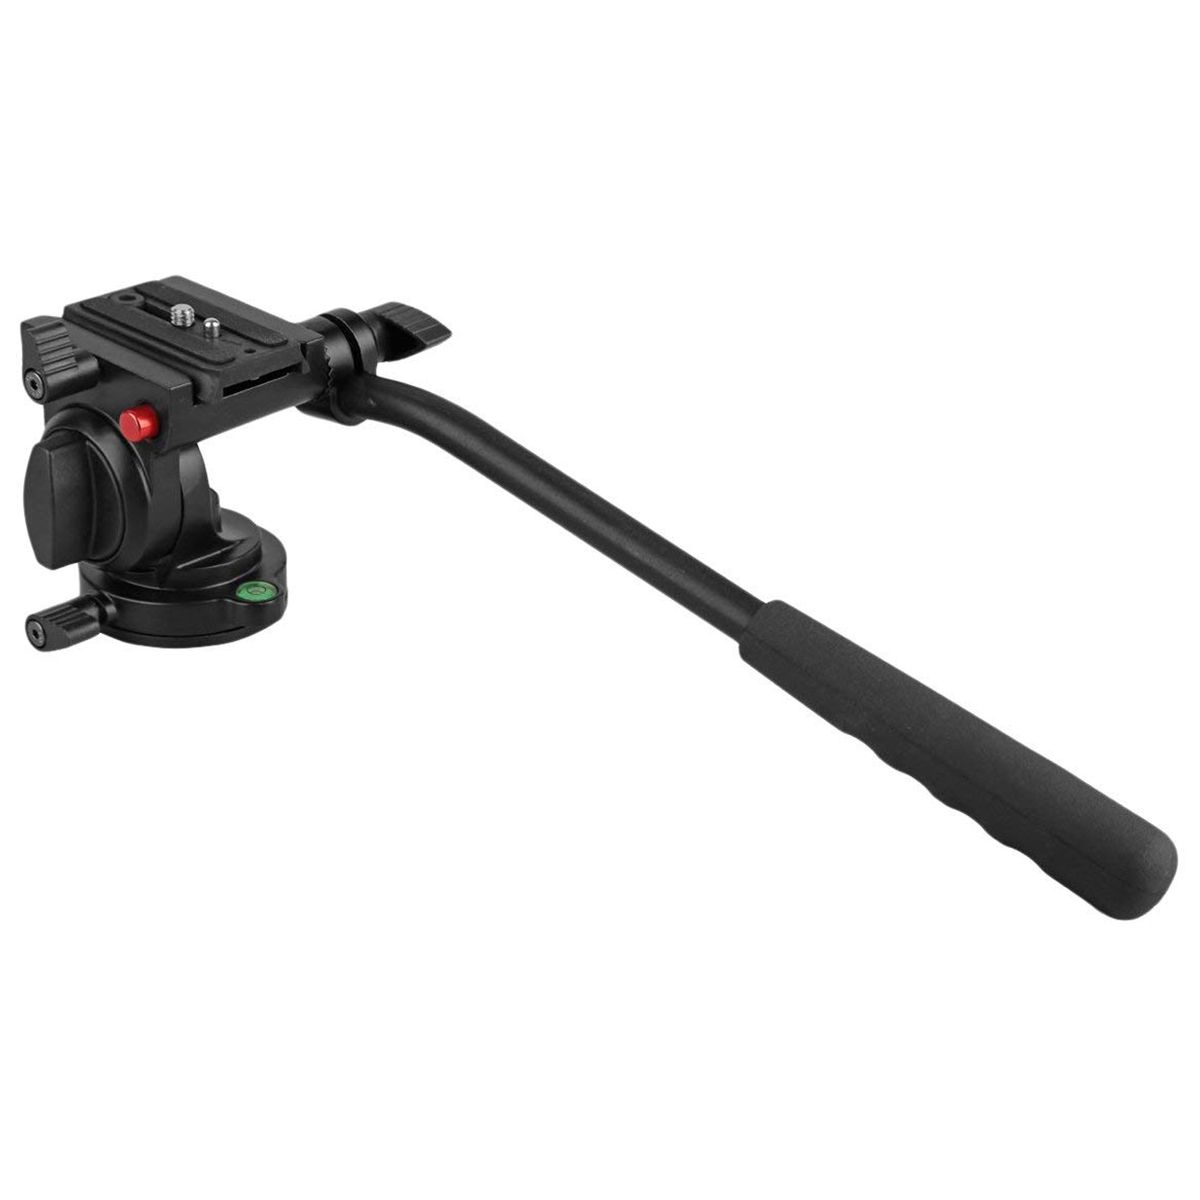 KINGJOY KH-6750 Flexible Aluminum Camera Tripod Head Fluid Video Tripod Head for